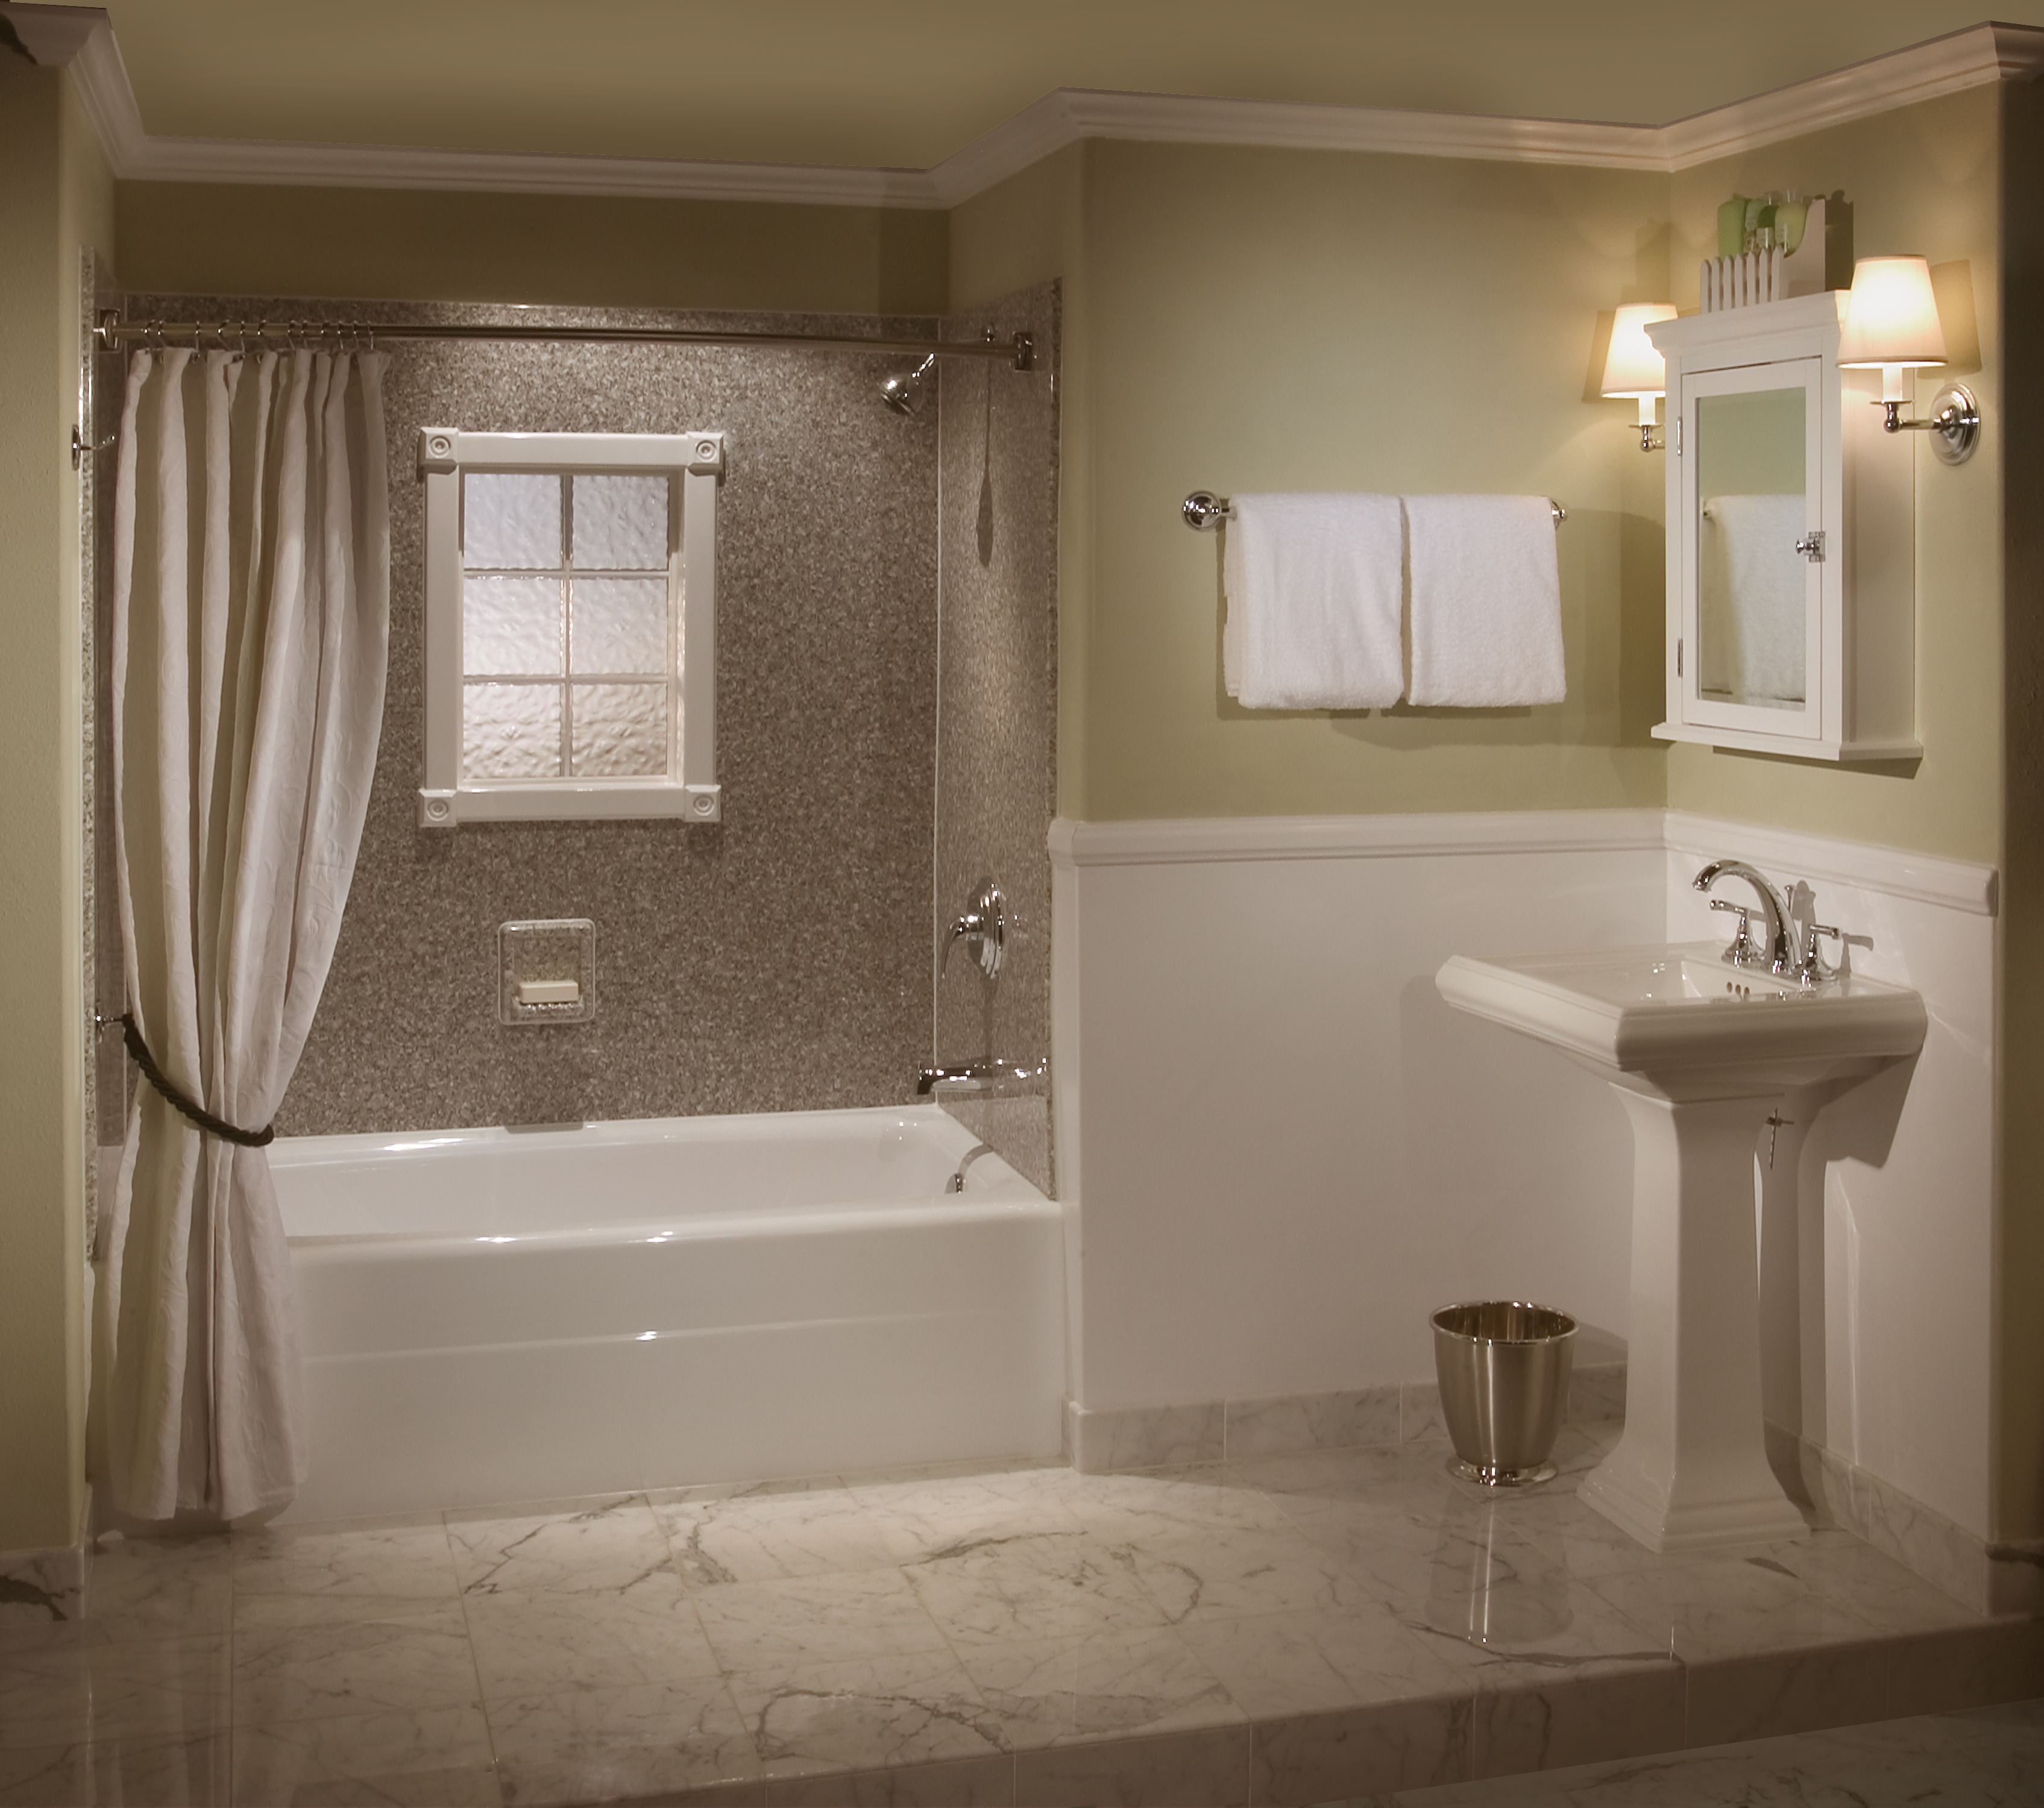 budget bathroom remodel ideas photo - 1